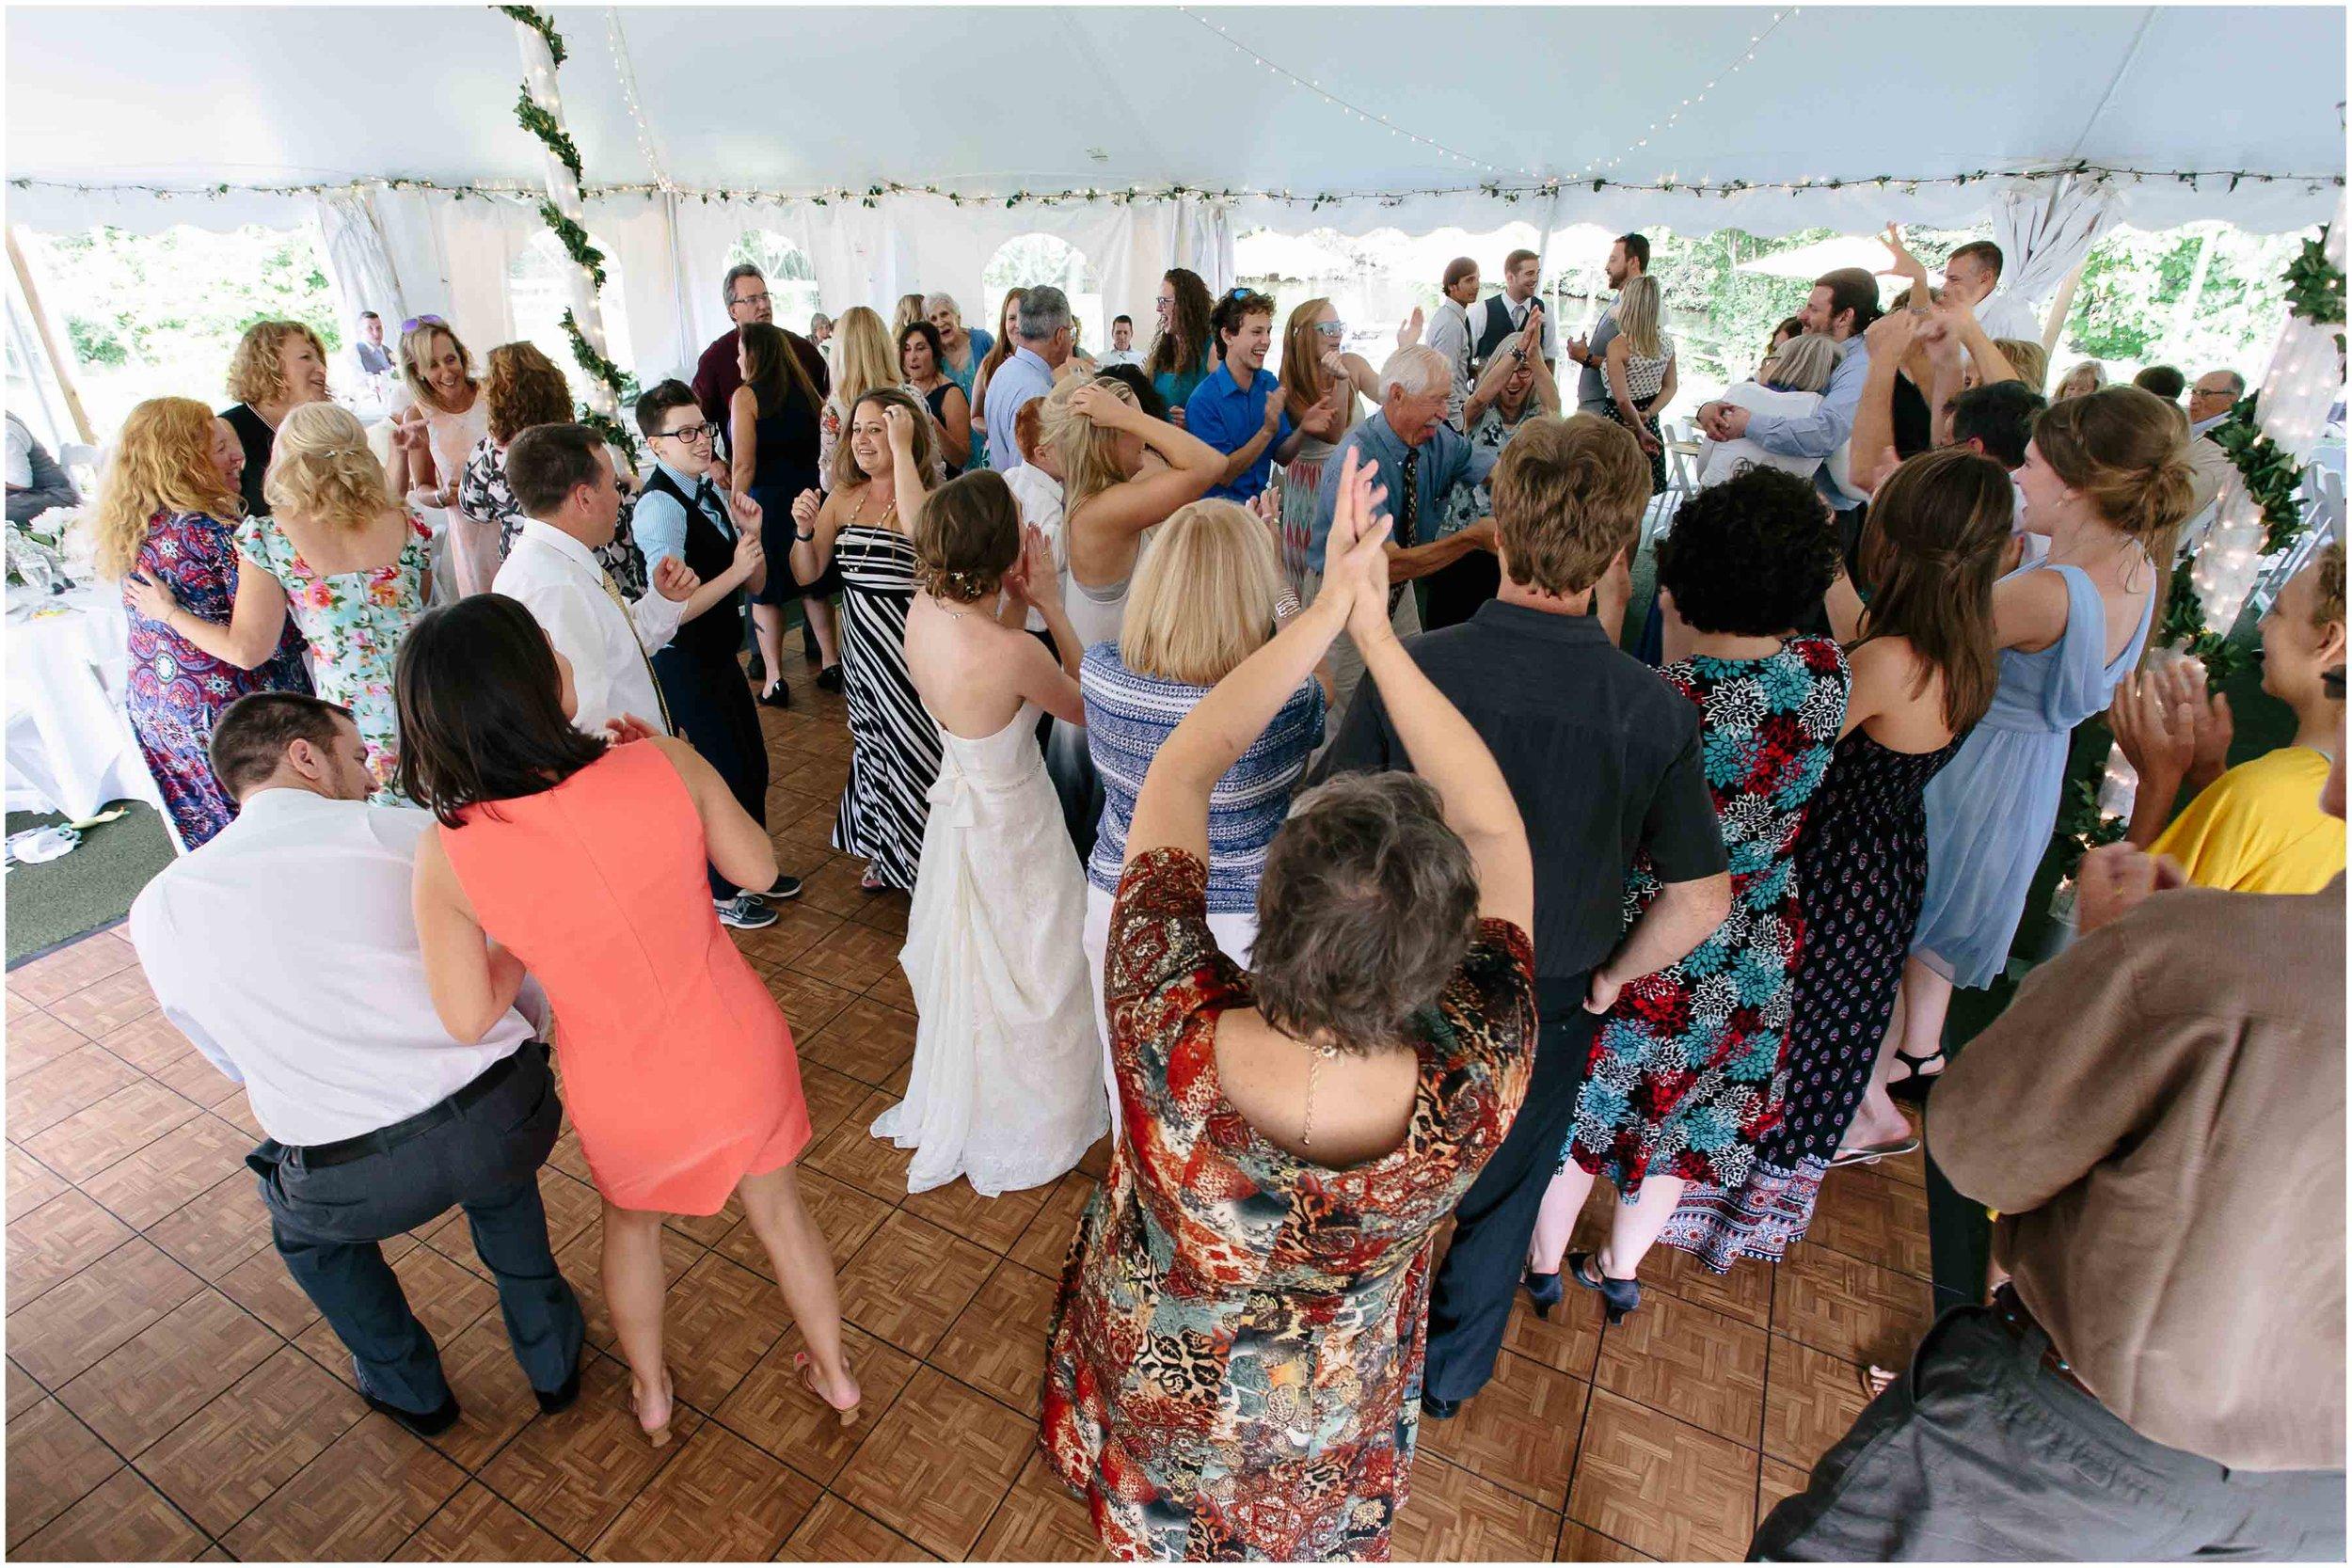 Sunny New Hampshire Summer Wedding at Mile Away Restaurant Milford - dancing